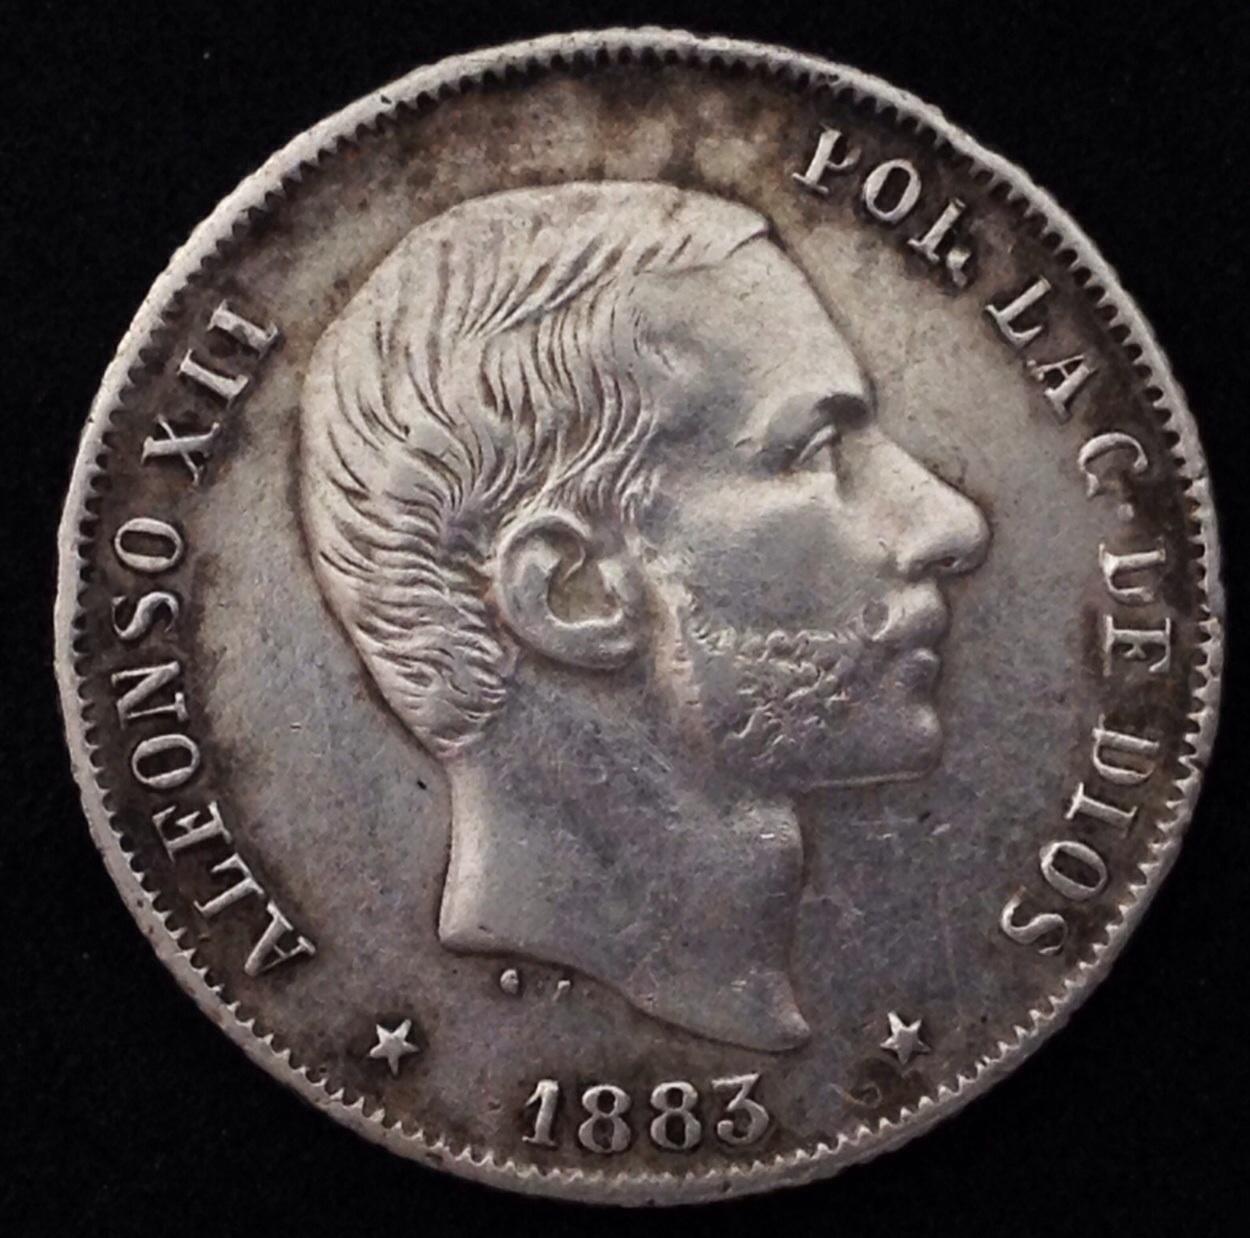 20 centavos de peso 1883 Alfonso XII - Kukuyeye dedit Image